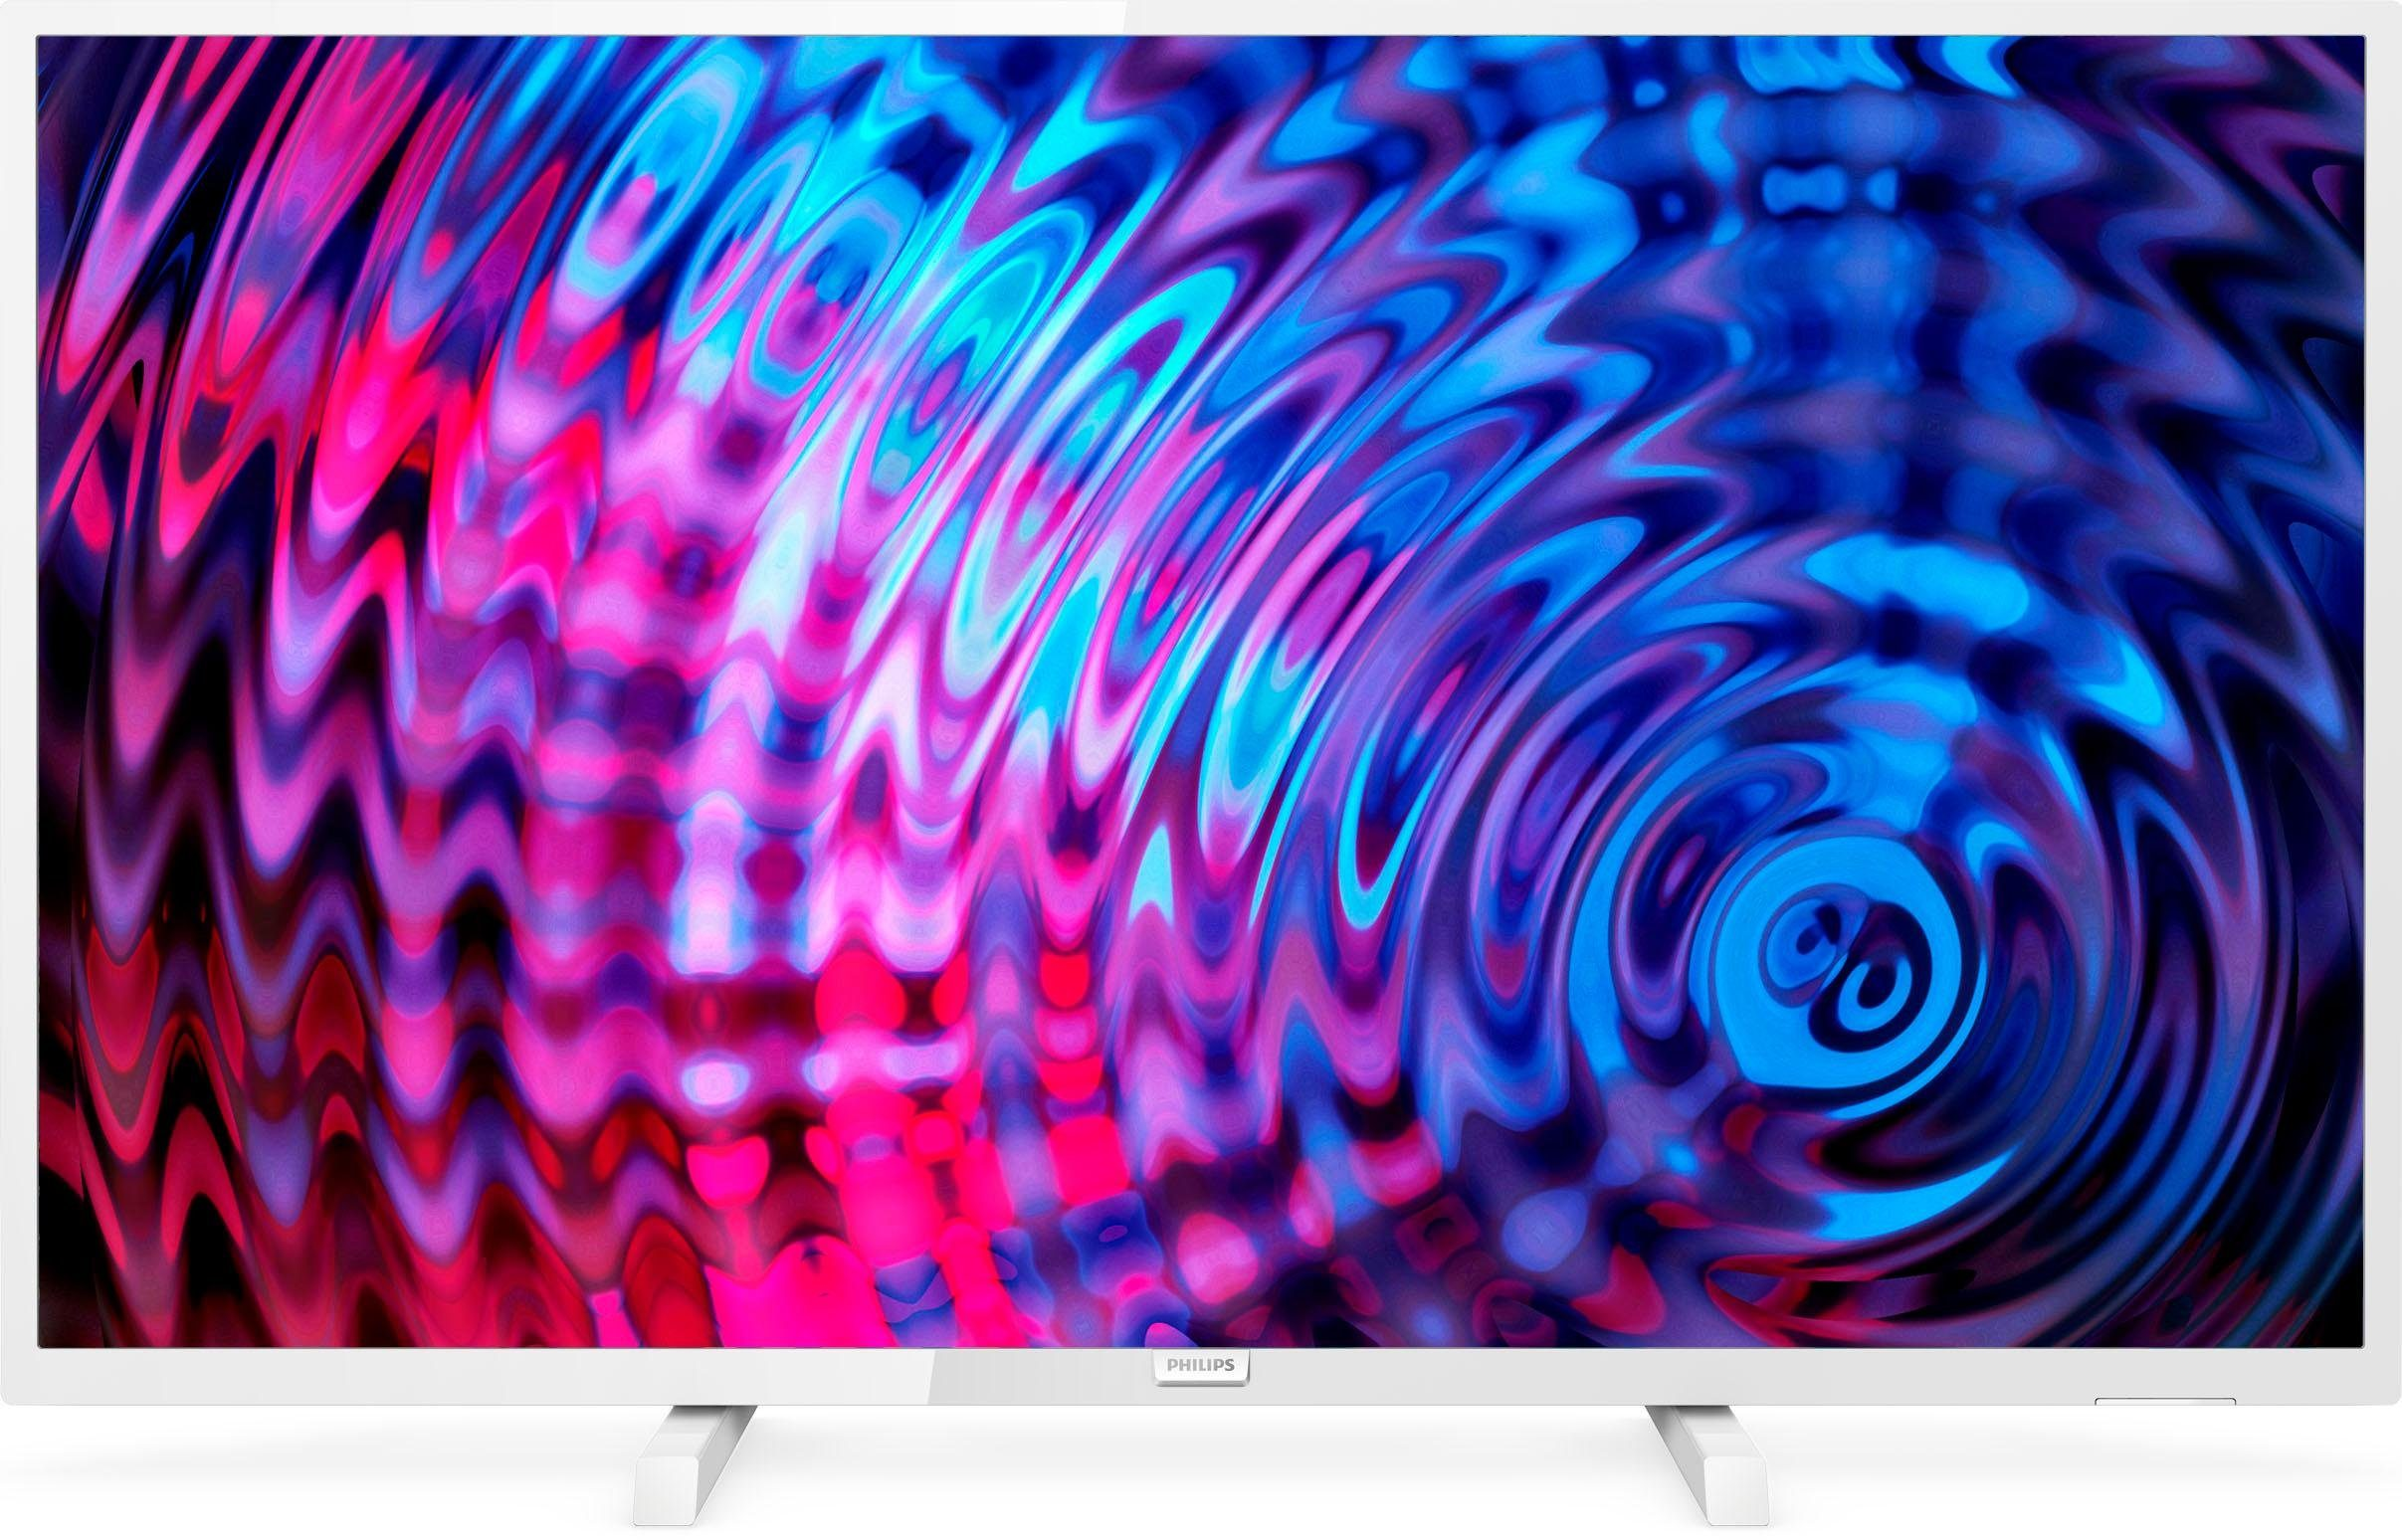 Philips 32PFS5603/12 LED-Fernseher (80 cm/32 Zoll, Full HD, USB-Recording)